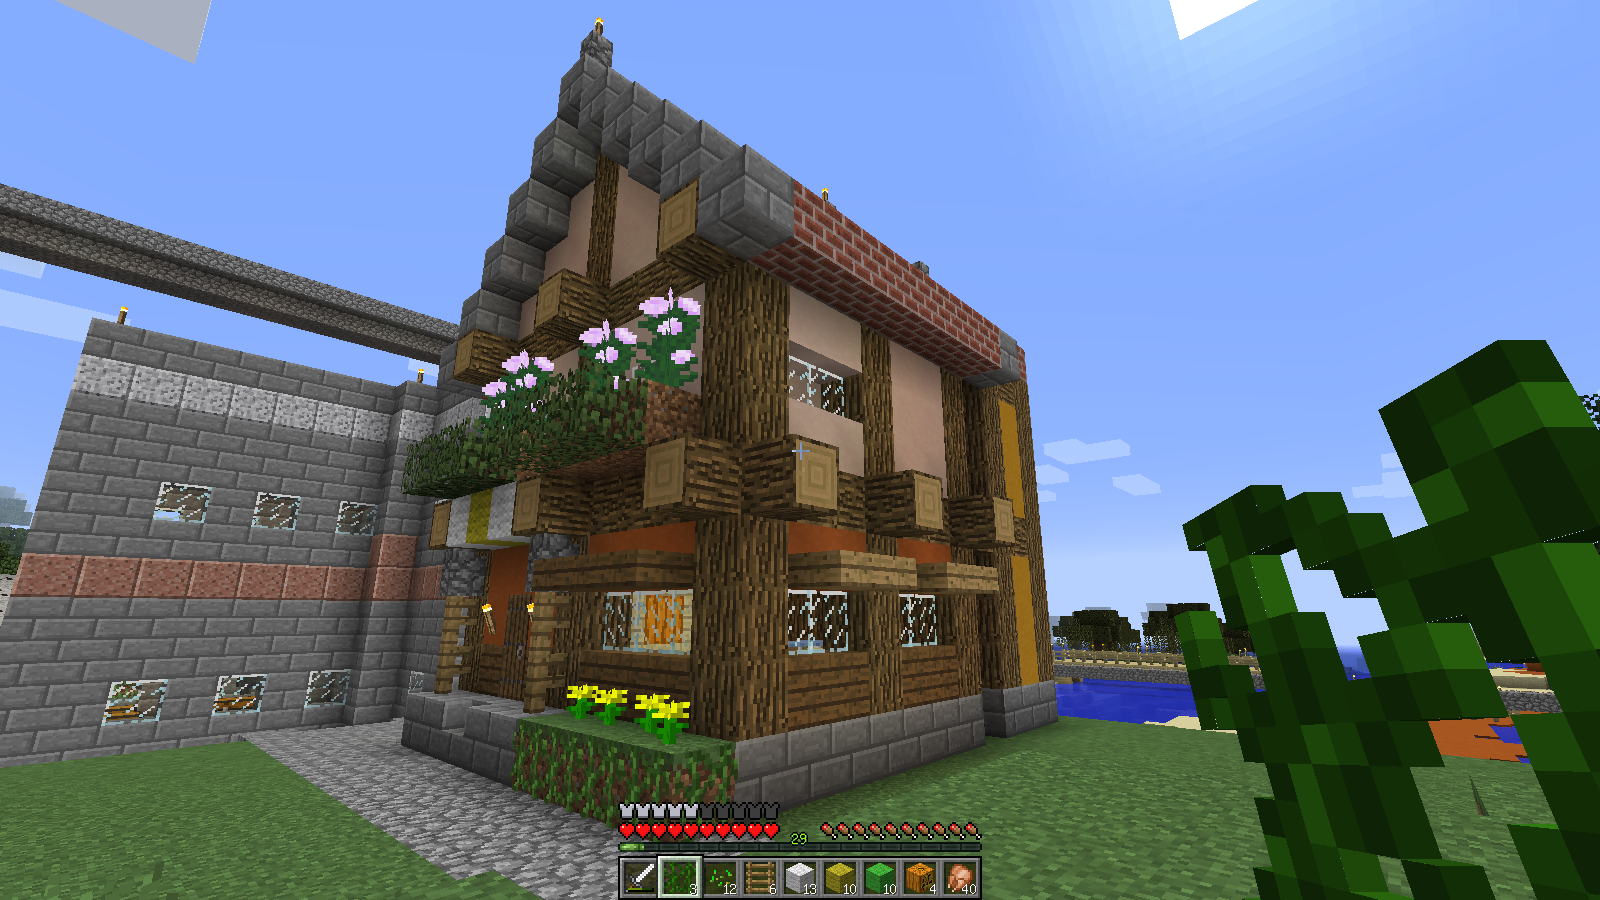 Minecraftの建築